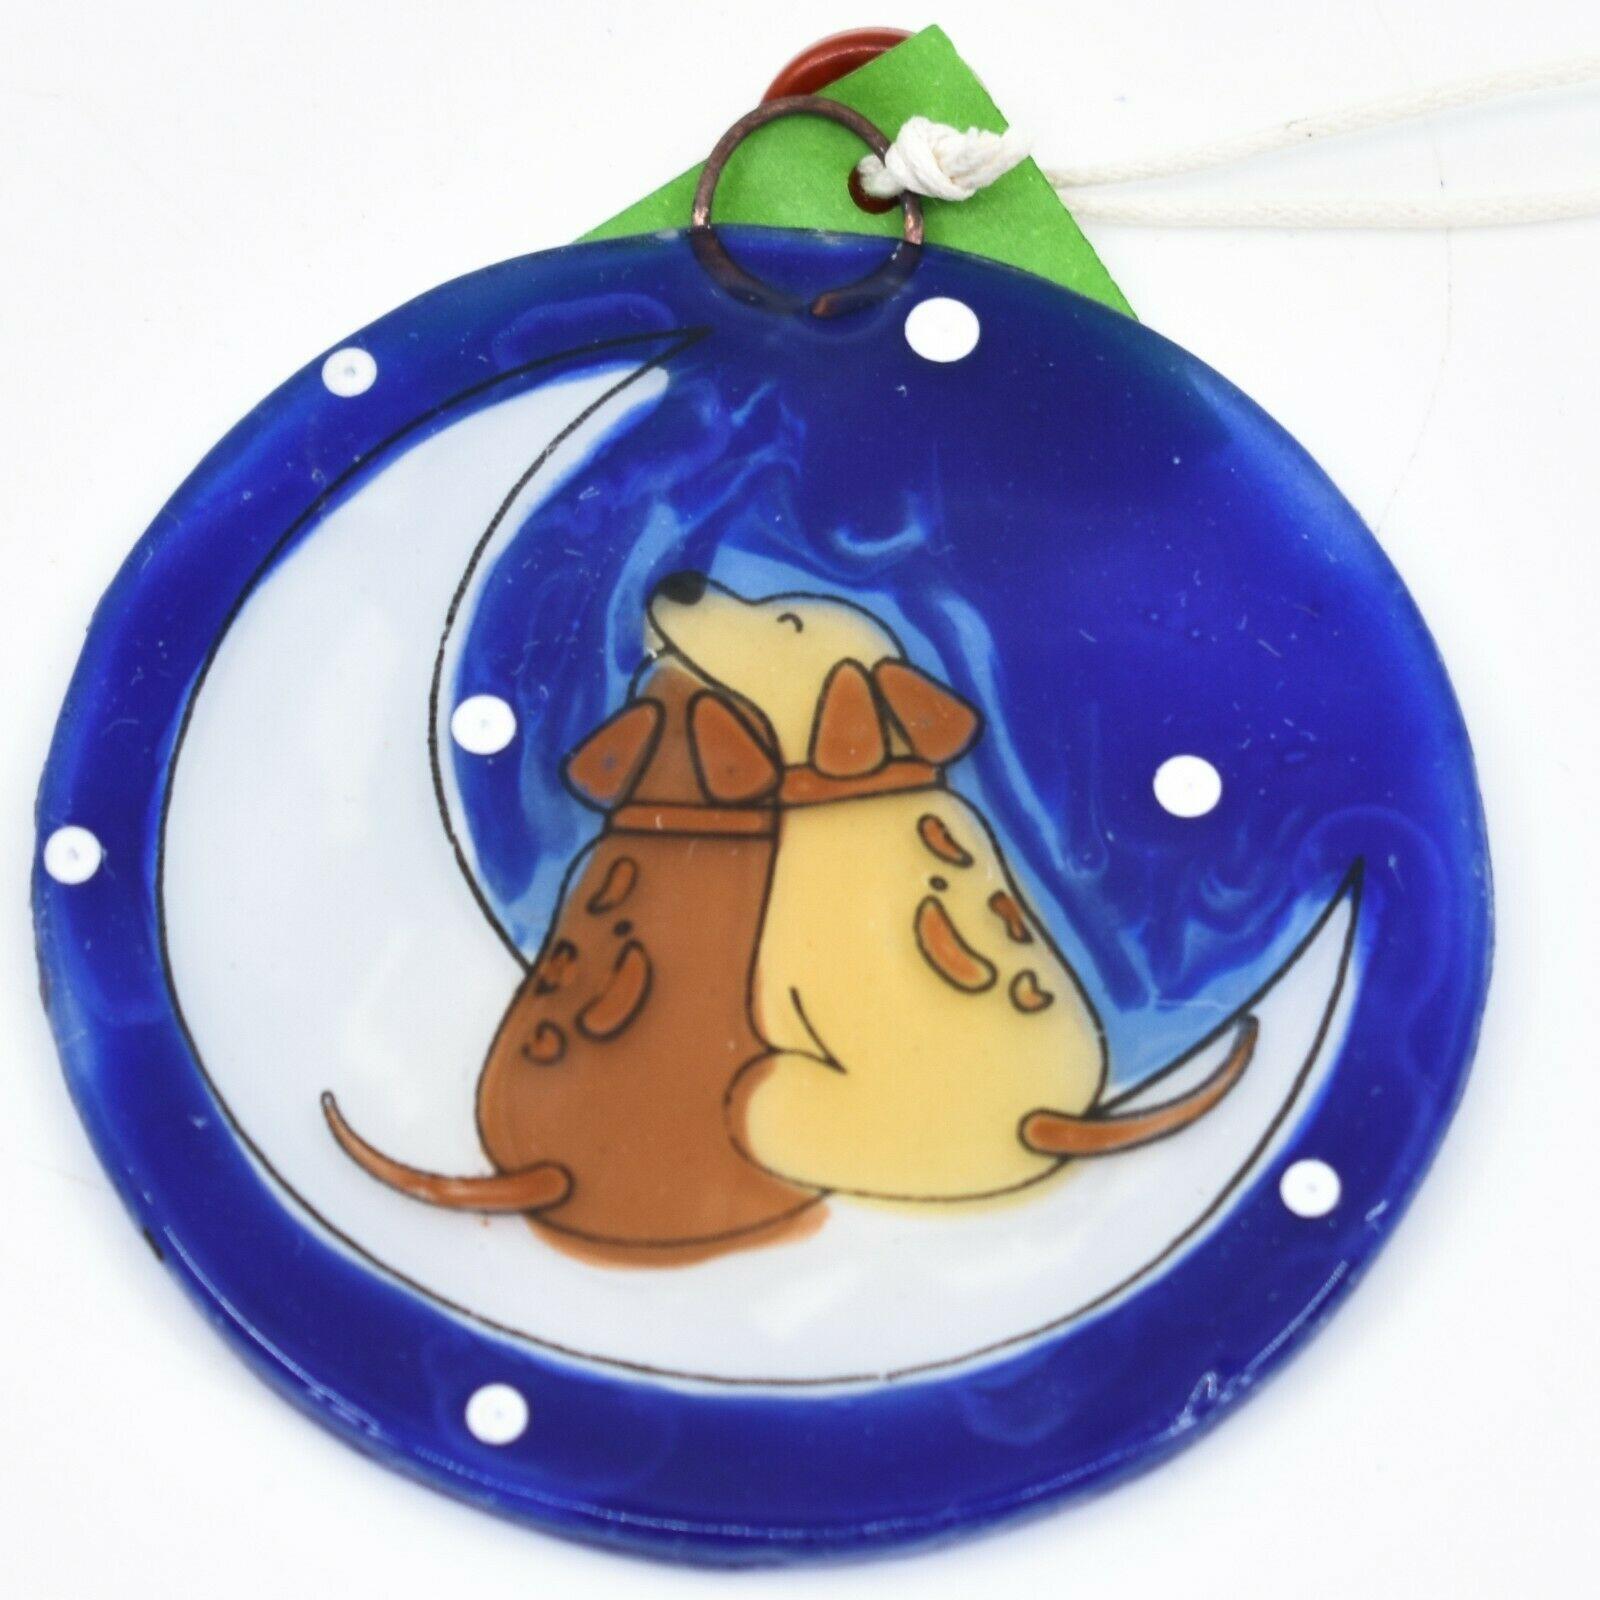 Fused Art Glass Dogs Cuddling on Moon Ornament Handmade in Ecuador